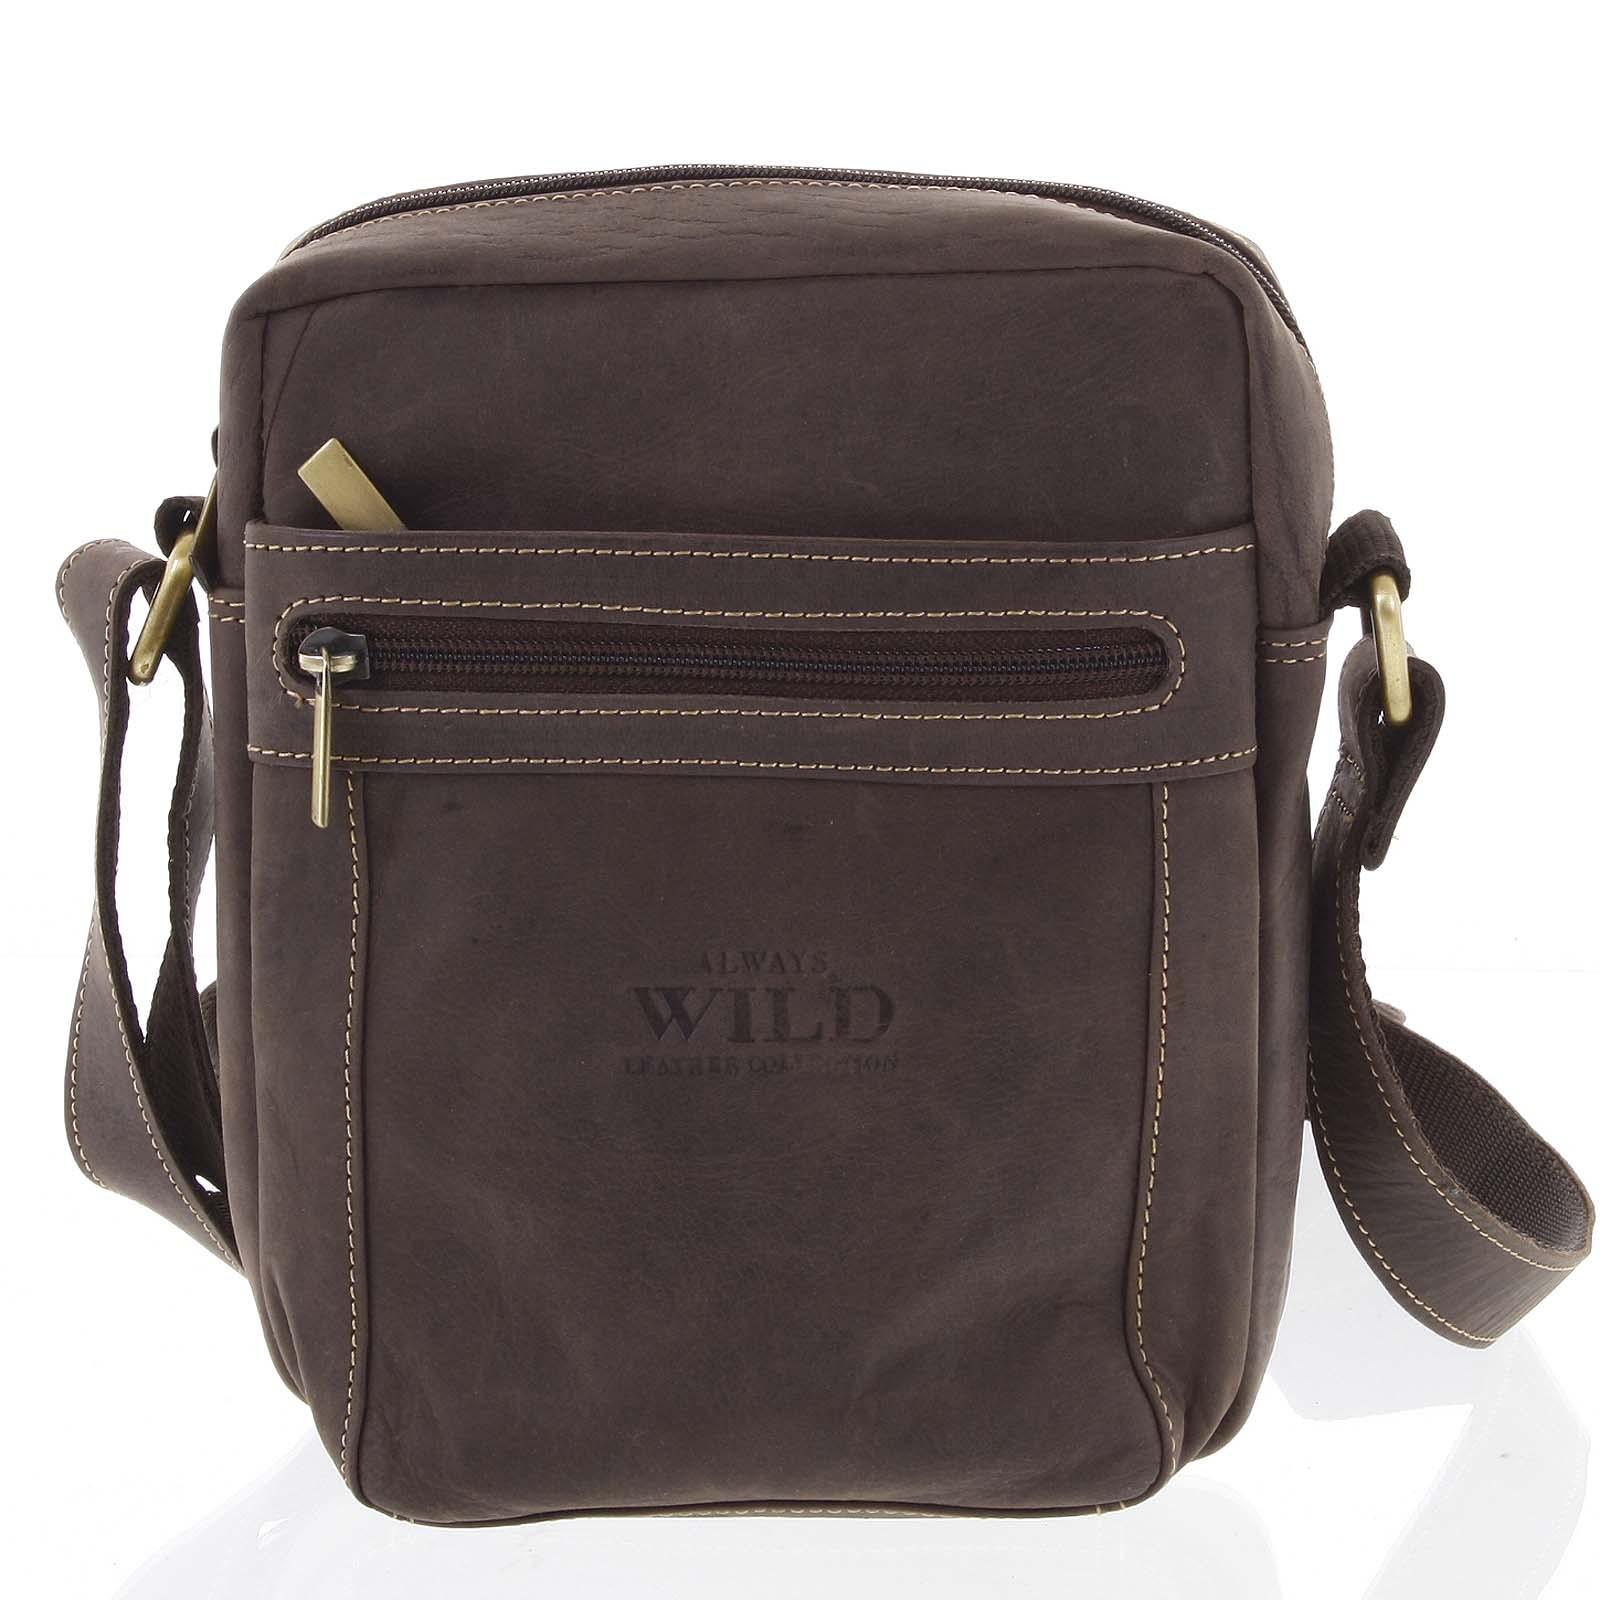 Pánská kožená crossbody taška tmavě hnědá - WILD Abilio